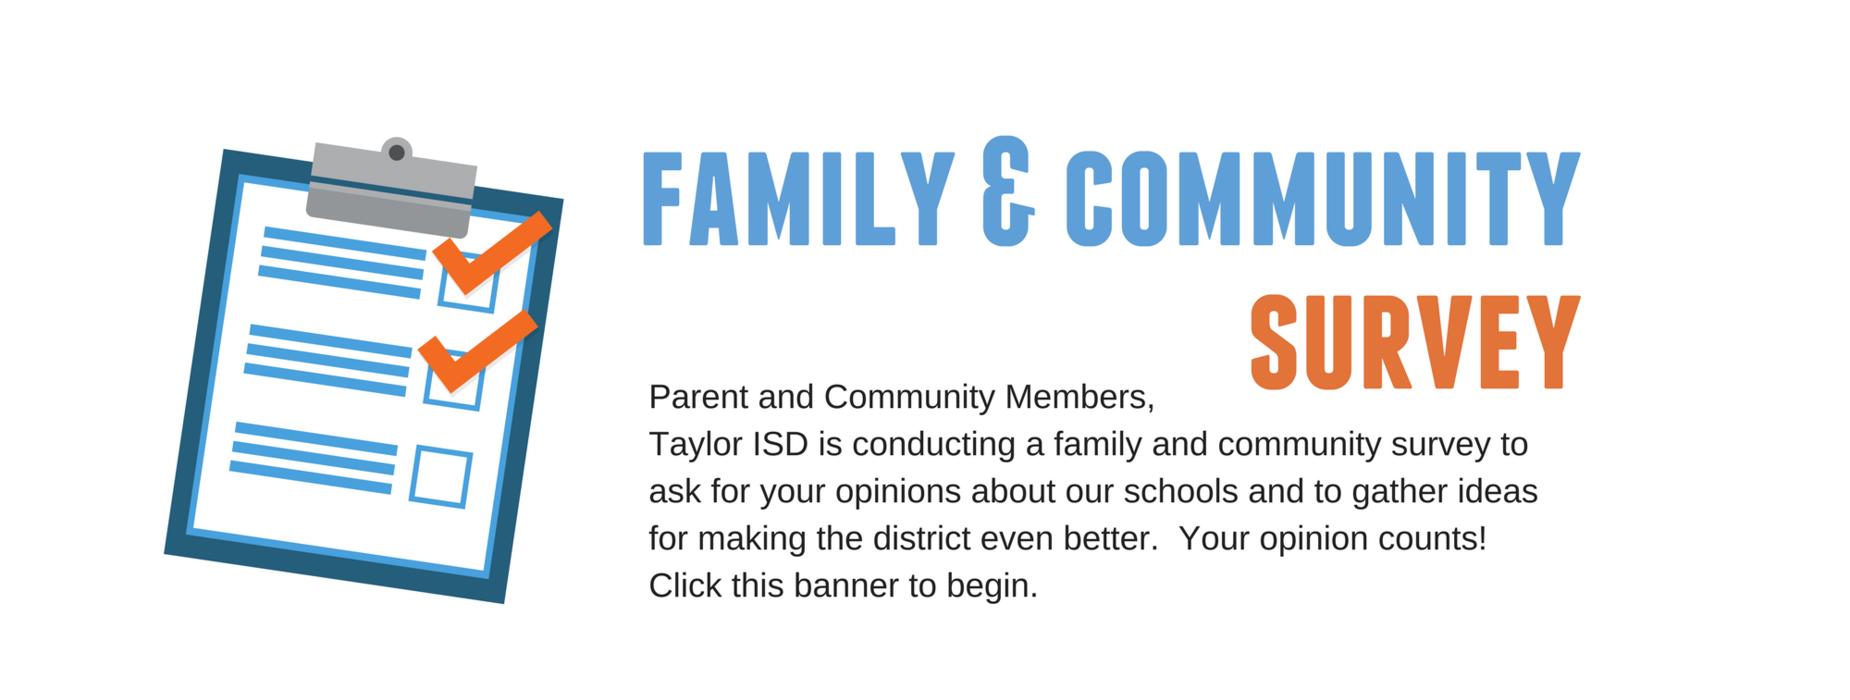 Family and Community Survey